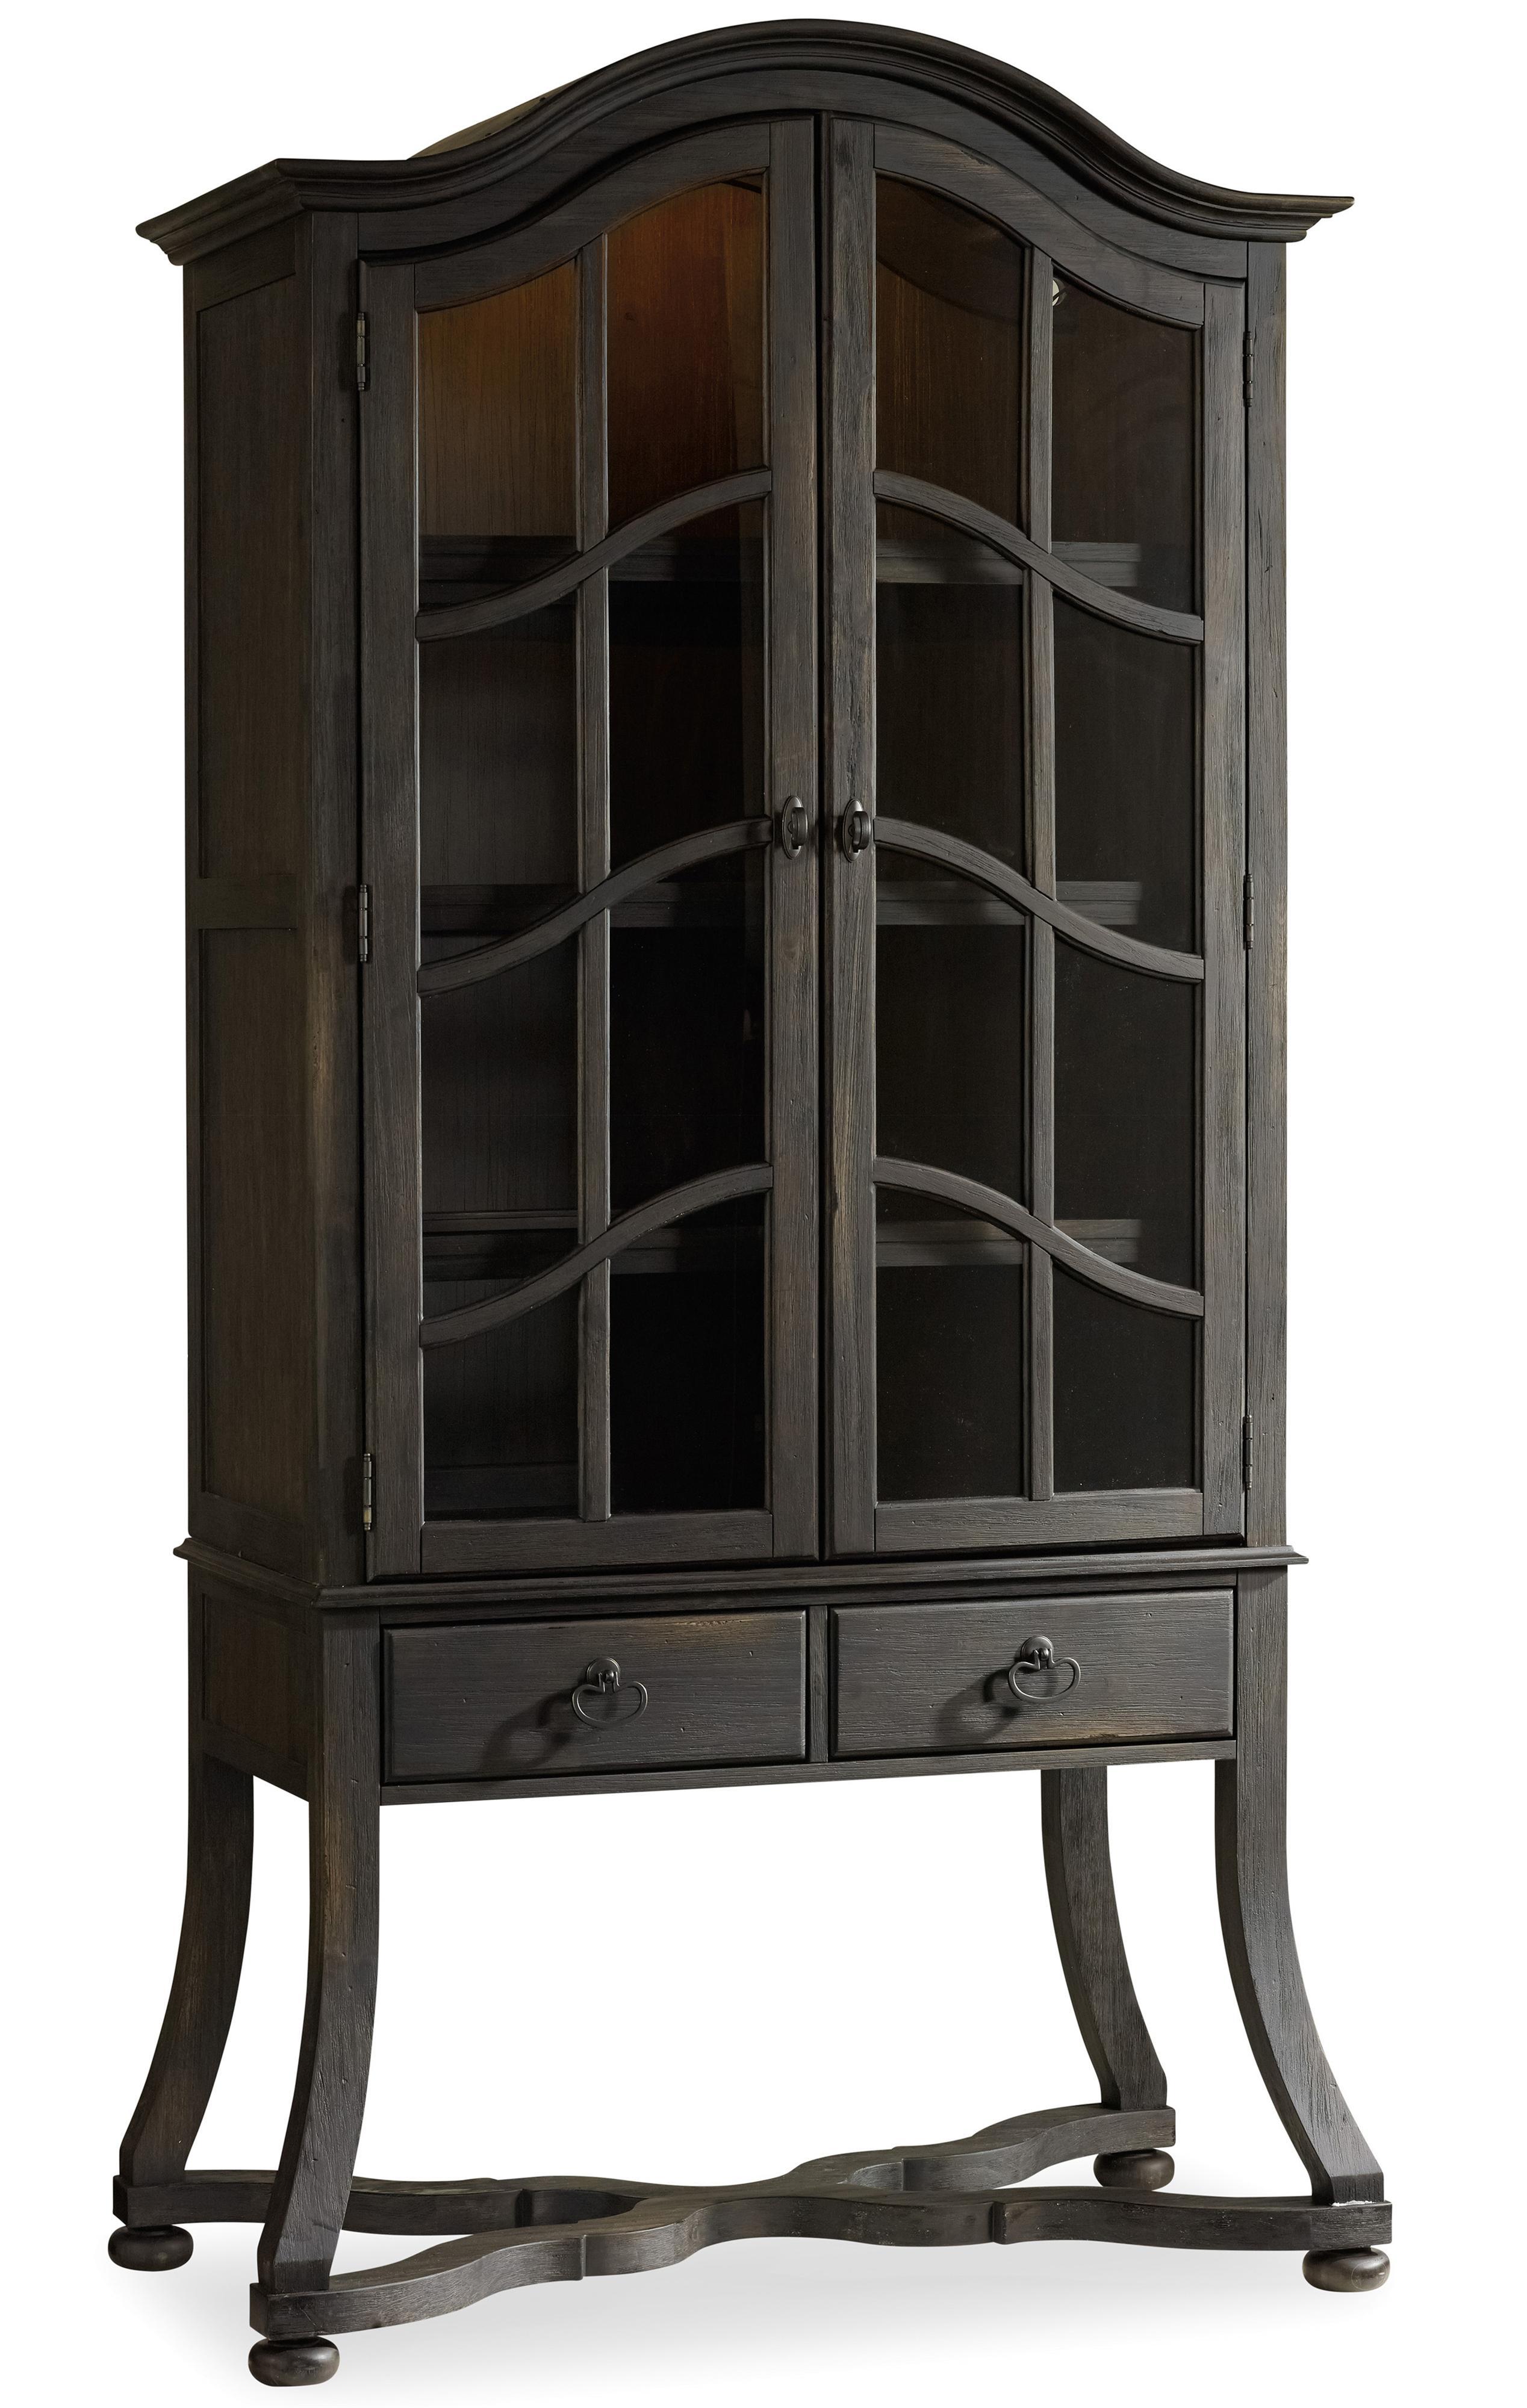 Corsica Display Cabinet by Hooker Furniture at Baer's Furniture